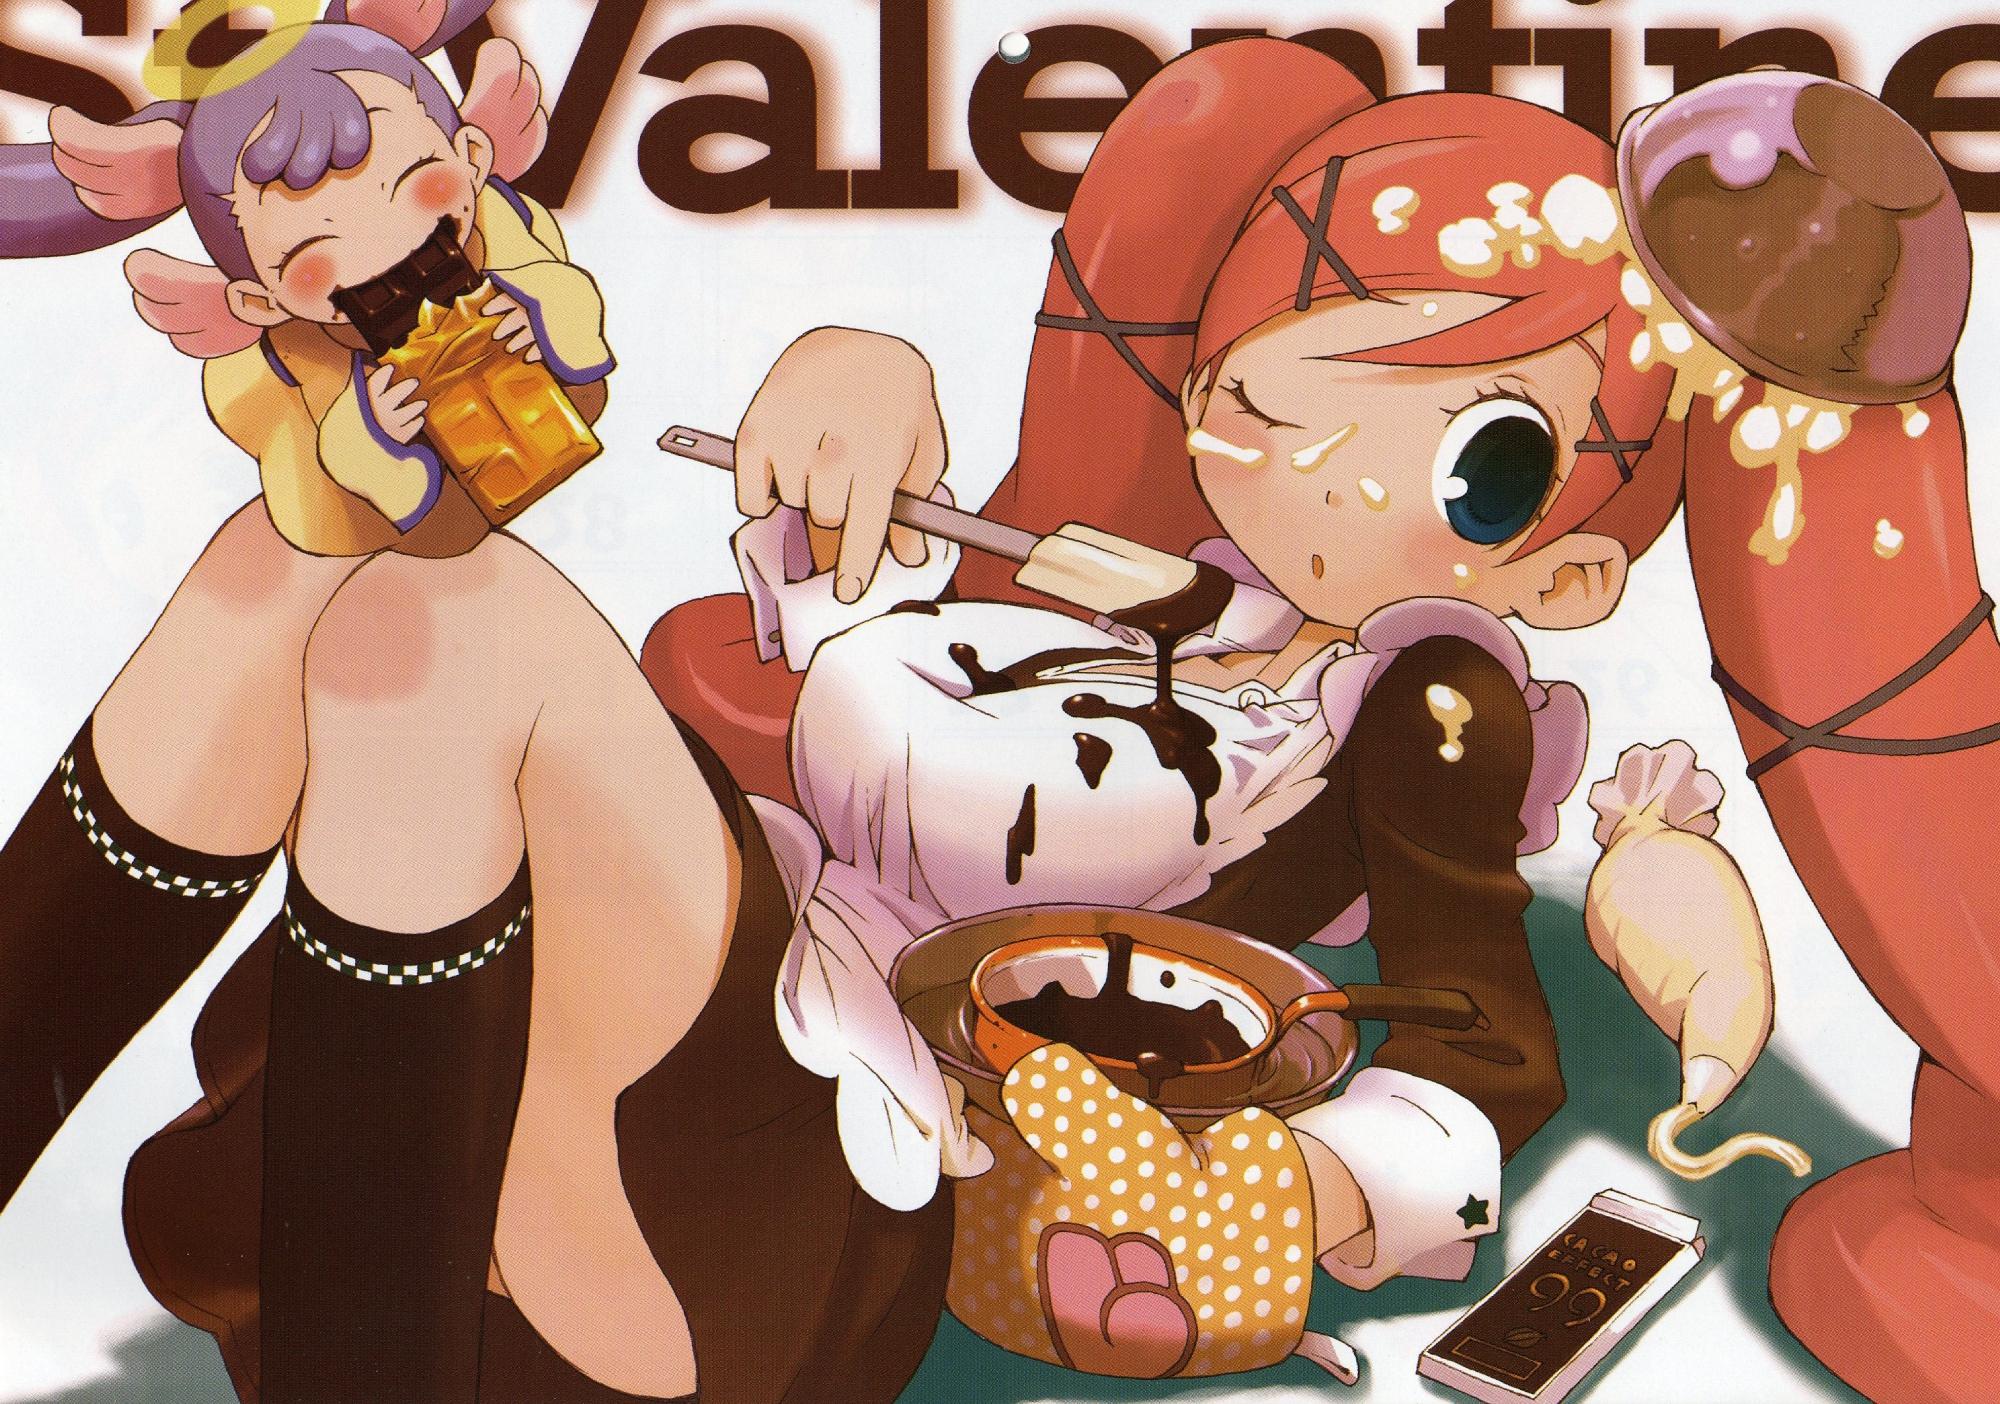 doki_doki_majo_shinpan tagro valentine